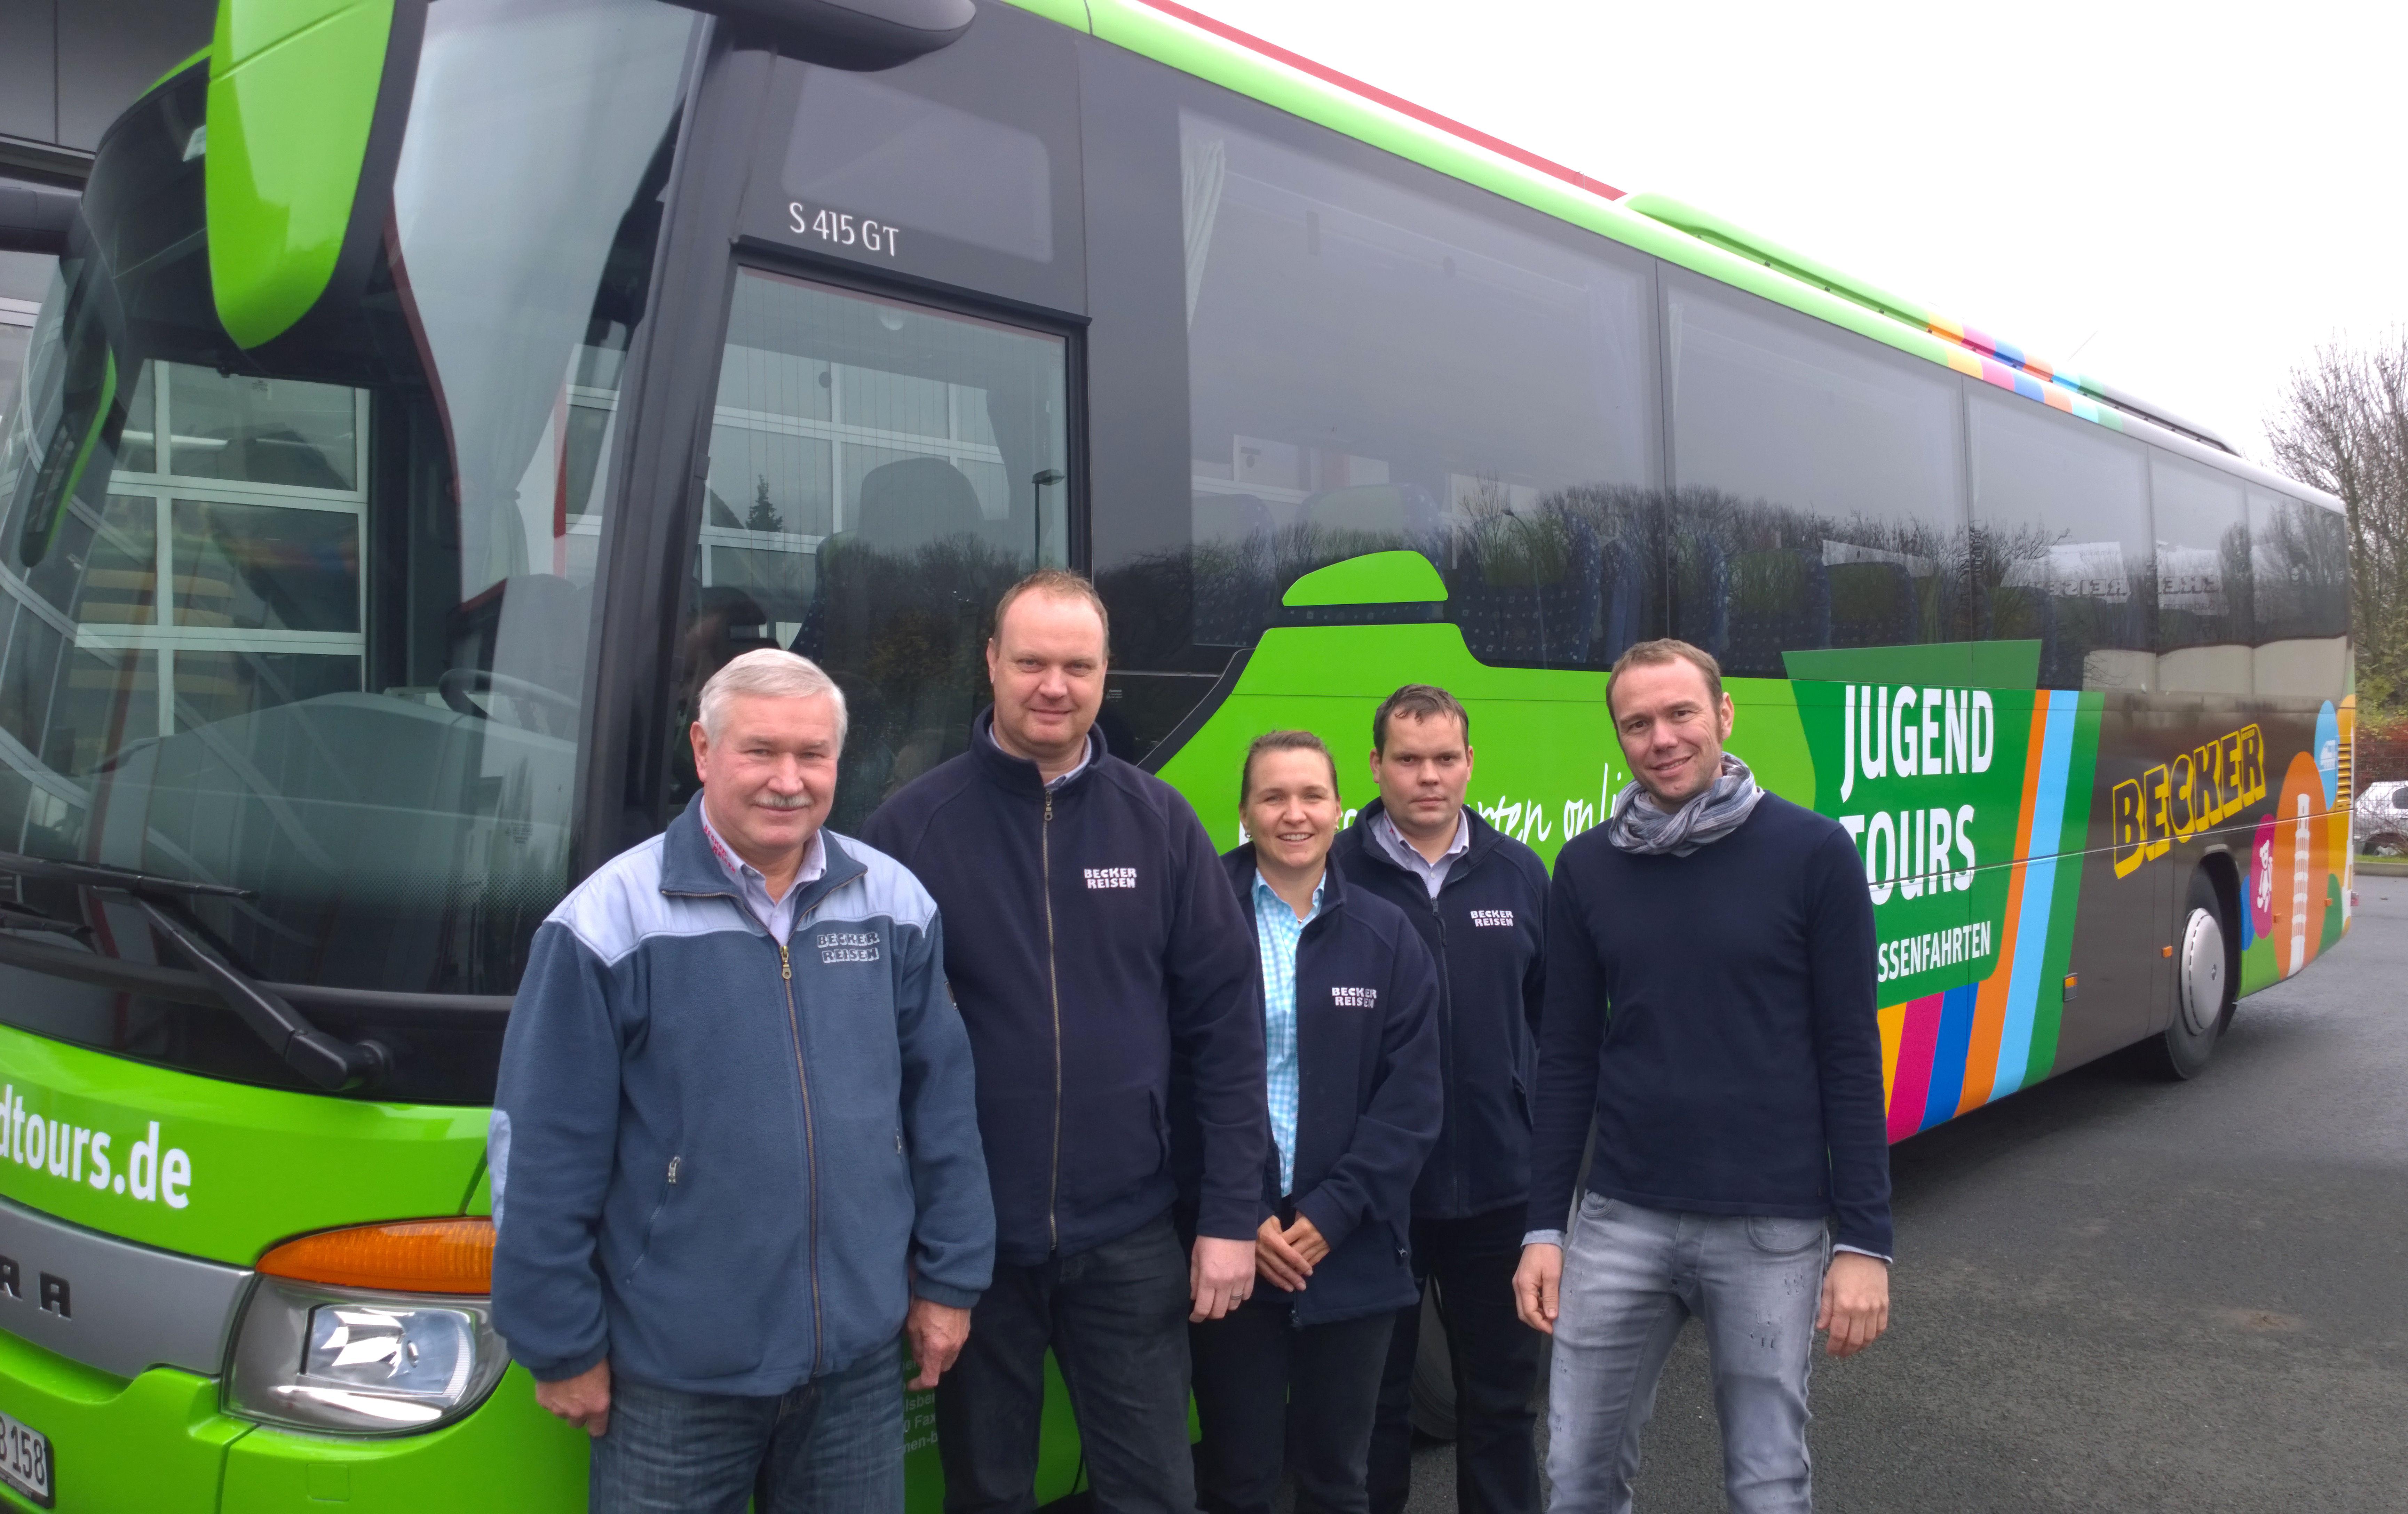 Übergabe Busbeschriftung Jugendtours Becker Reisen Thüringen